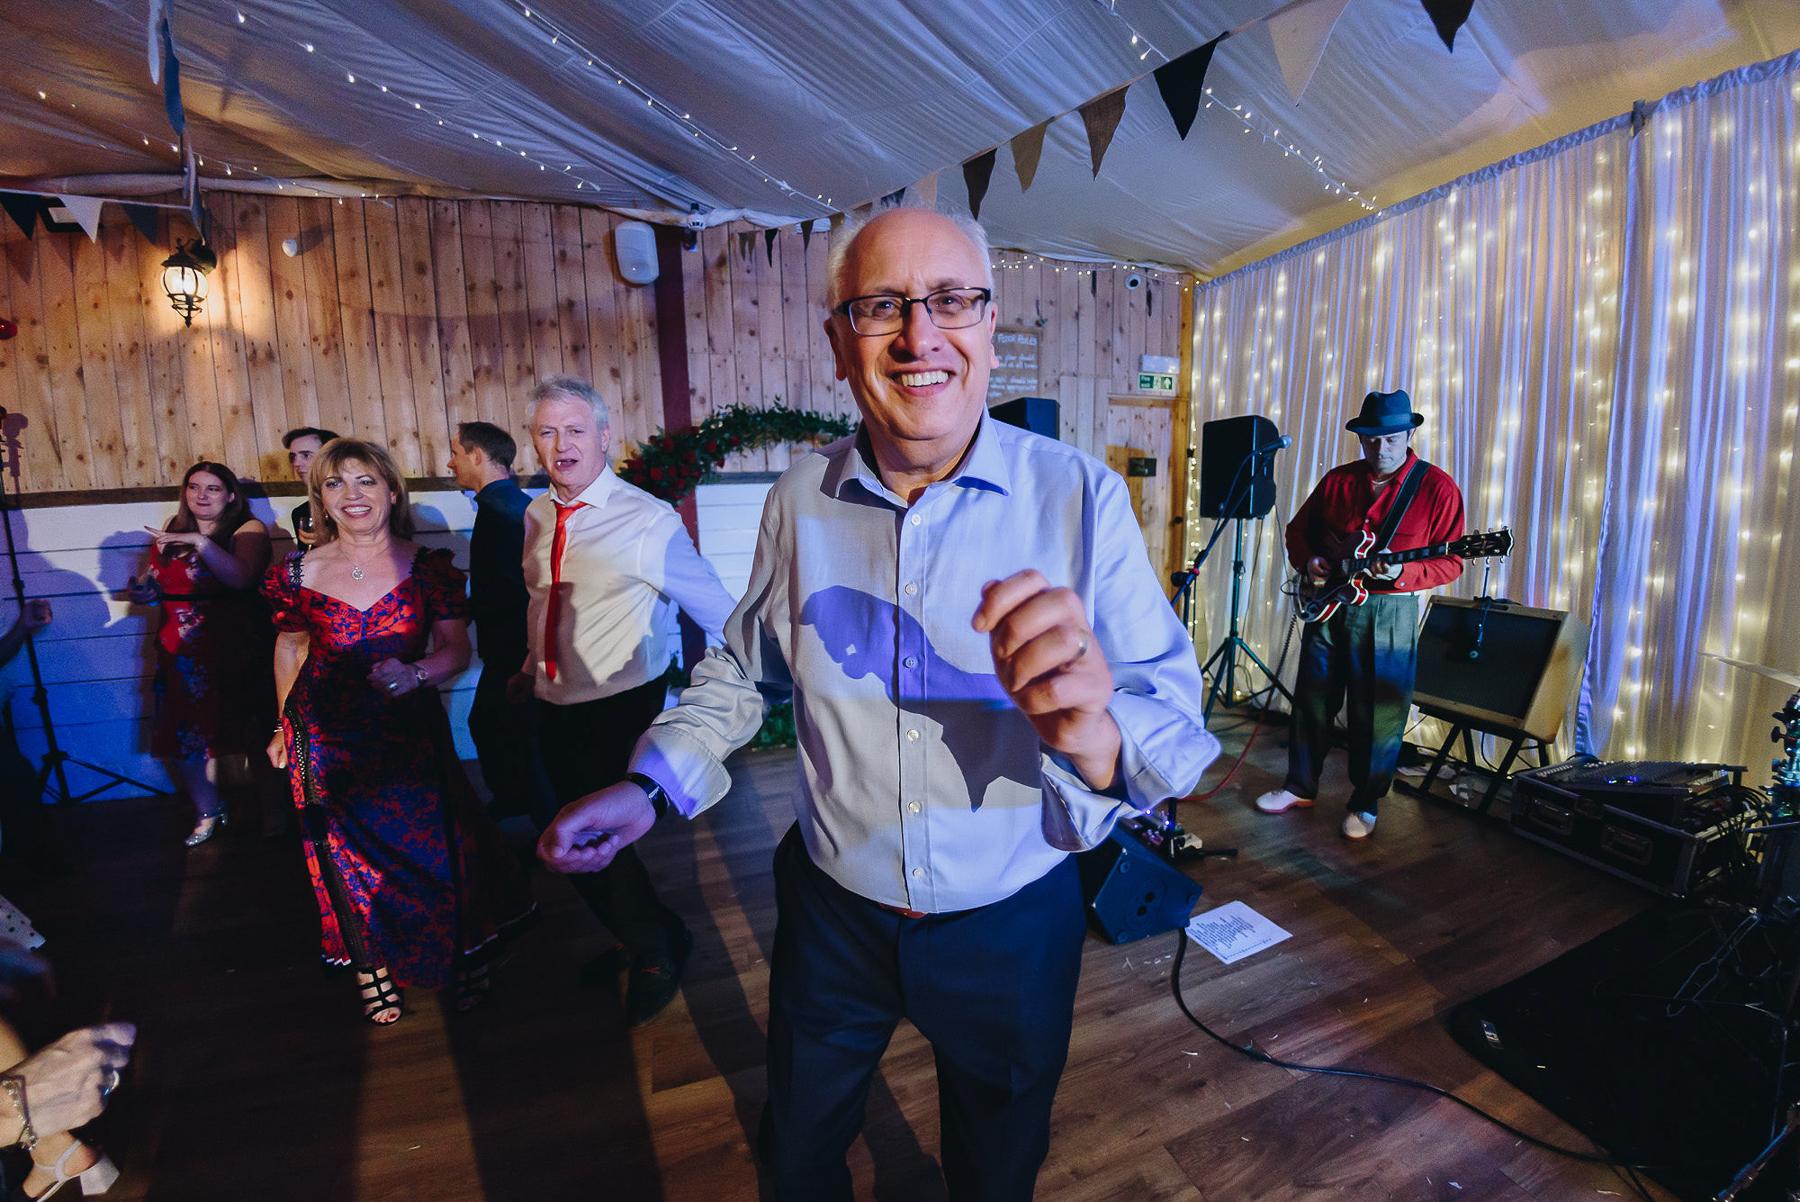 Wellbeing_Farm_Wedding_Photography_The_Pin-Up_Bride_Lara_Shaun-161.jpg